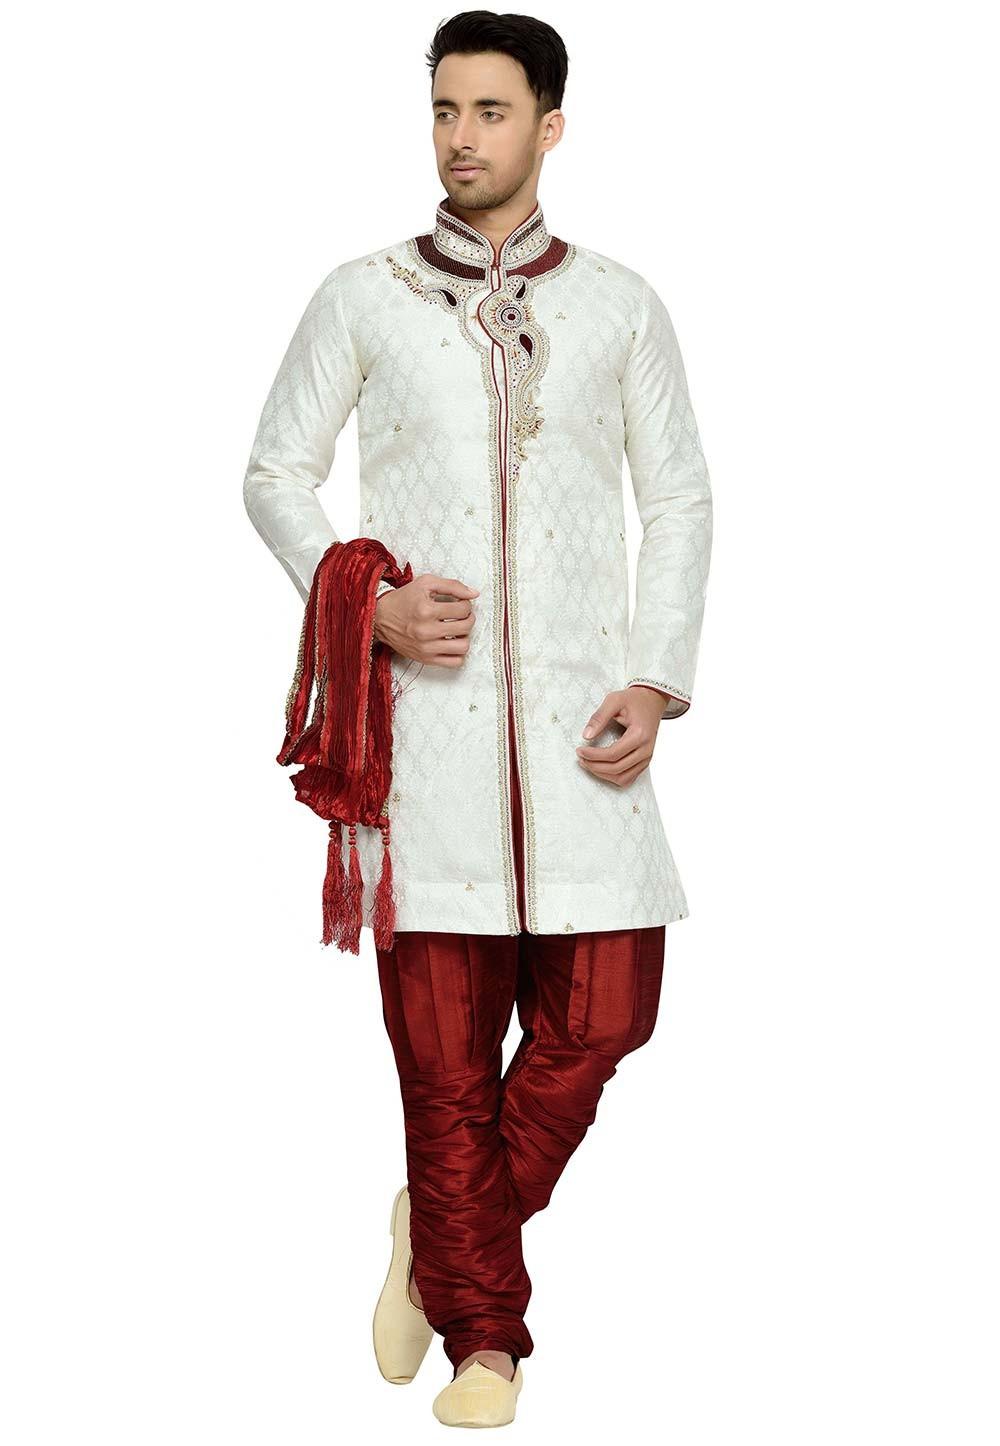 Off White Color Brocade Fabric Readymade Kurta Pyjama.